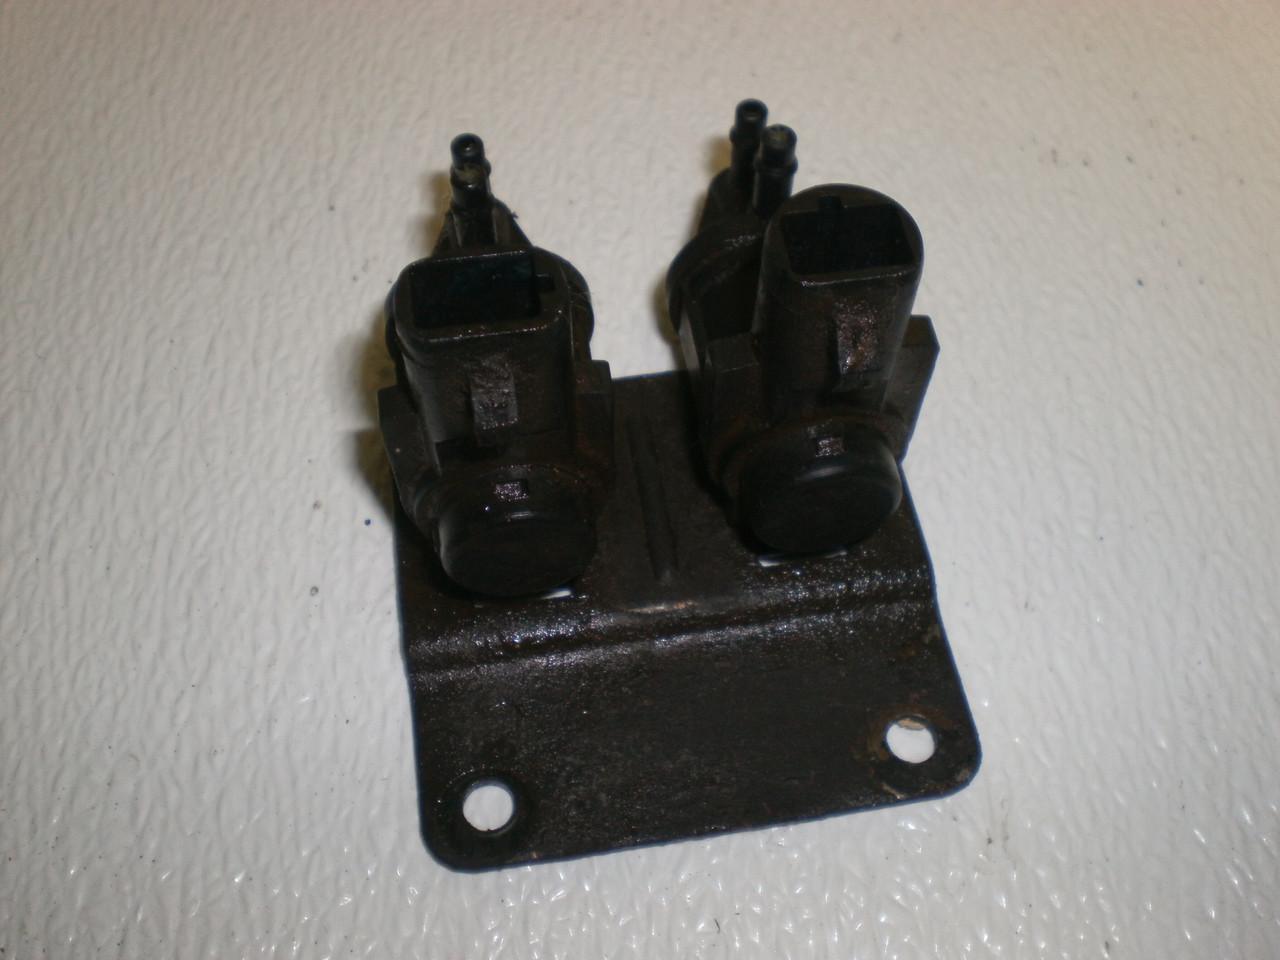 1987-1993 Ford Mustang 5 0 GT 302 V8 Smog Sensors EGR Evap Controler Vacuum